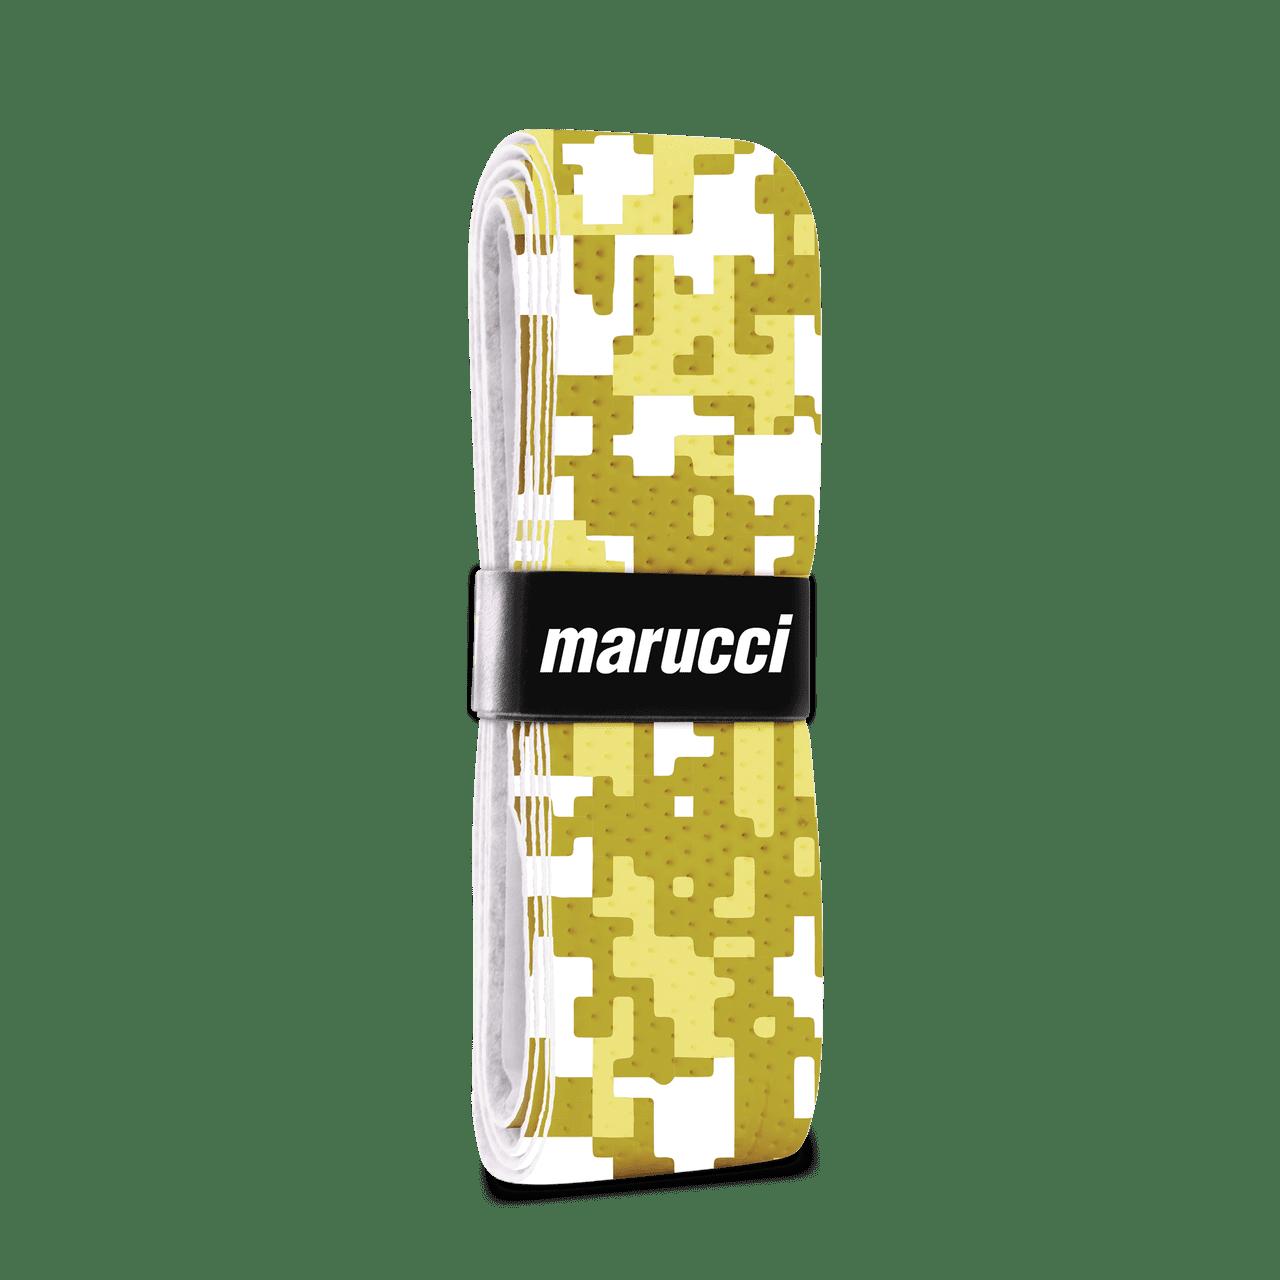 Marucci Bat Grip 1.75 mm - Gold Camo